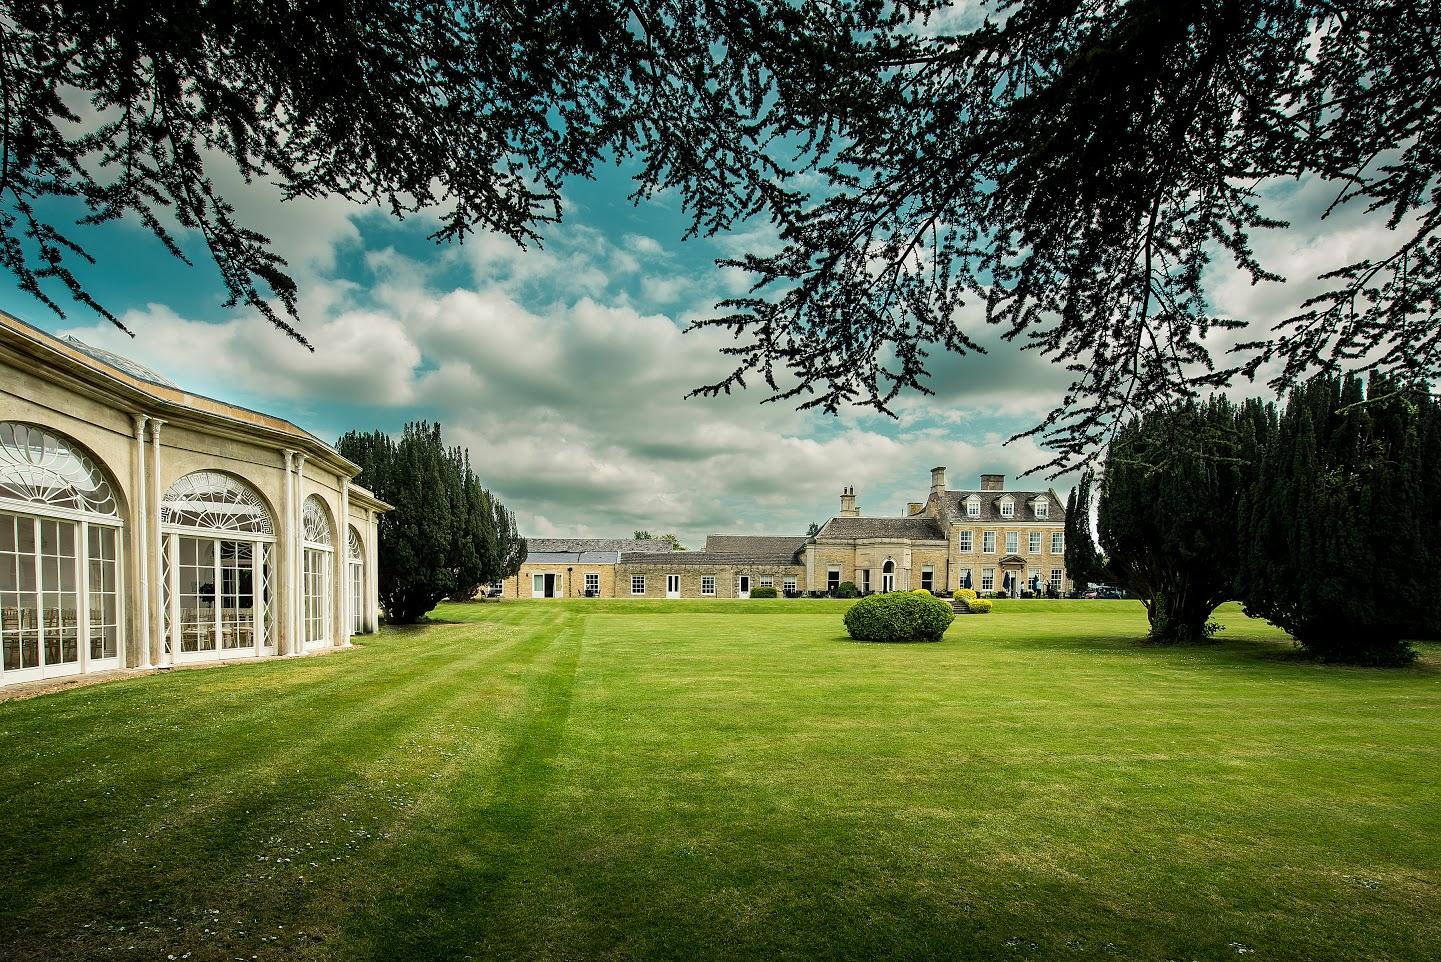 Barton Hall Hotel Wedding Venue in Northamptonshire